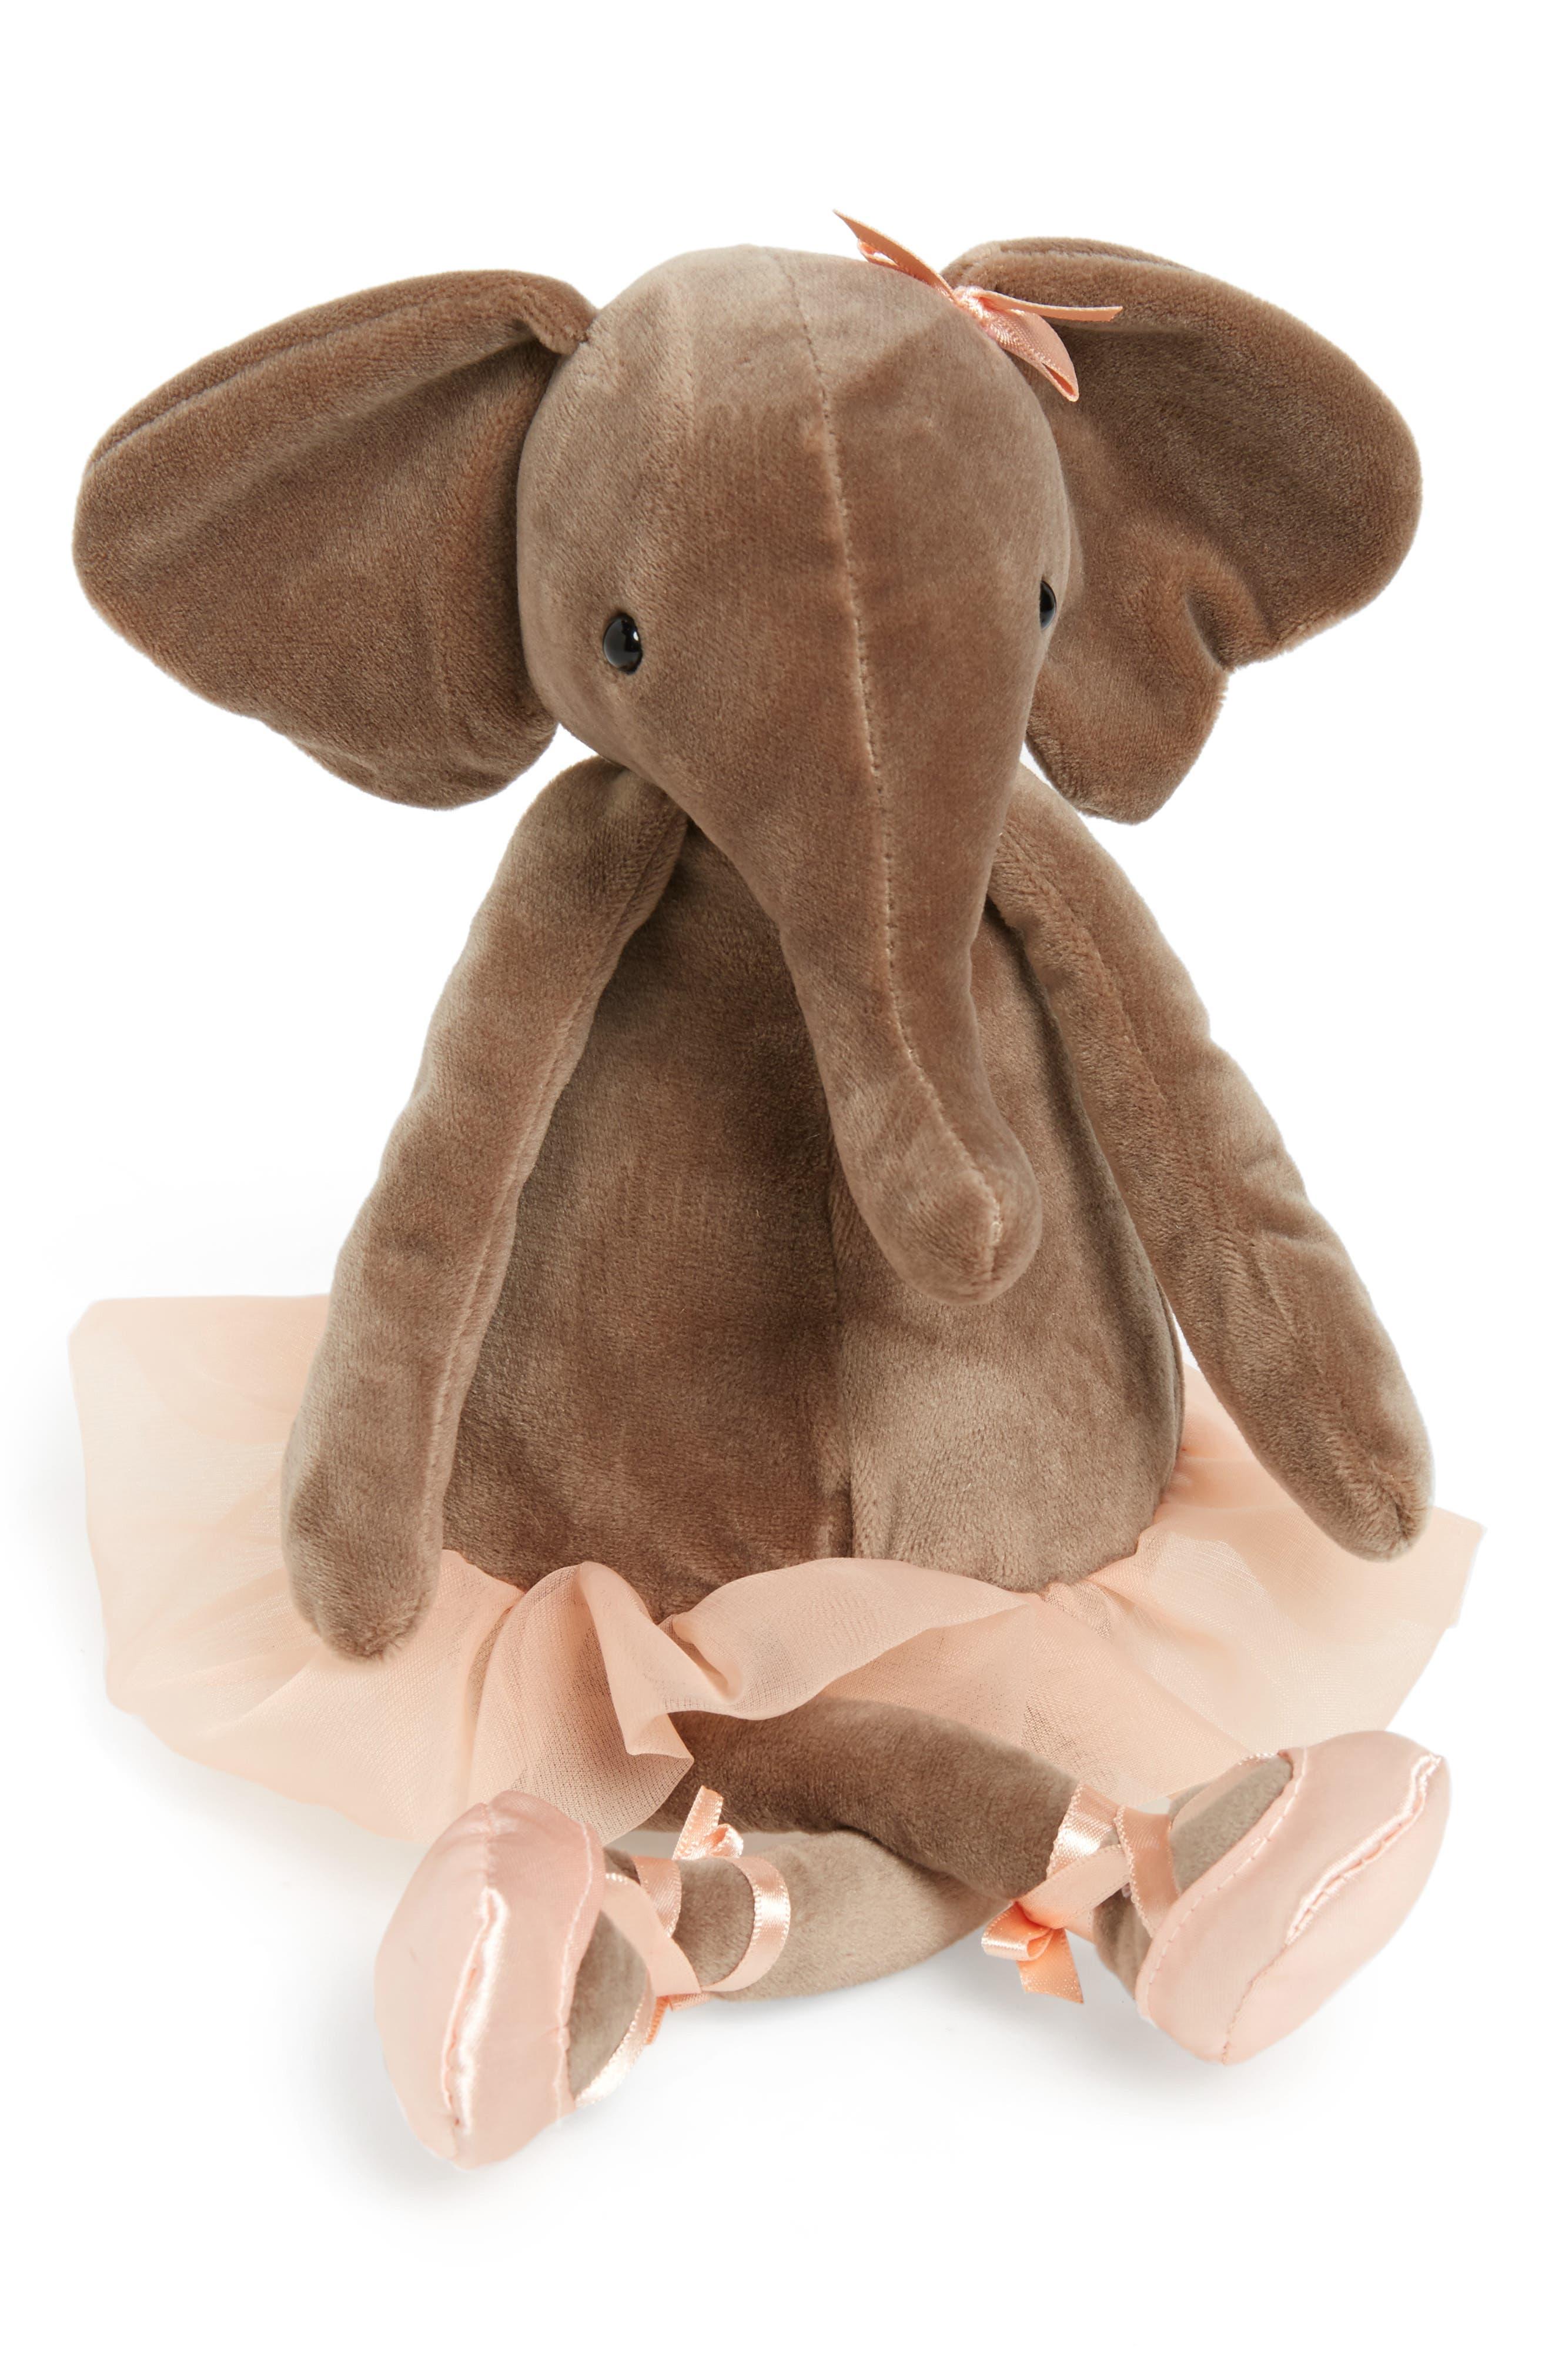 Dancing Darcey - Elephant Stuffed Animal,                             Main thumbnail 1, color,                             200